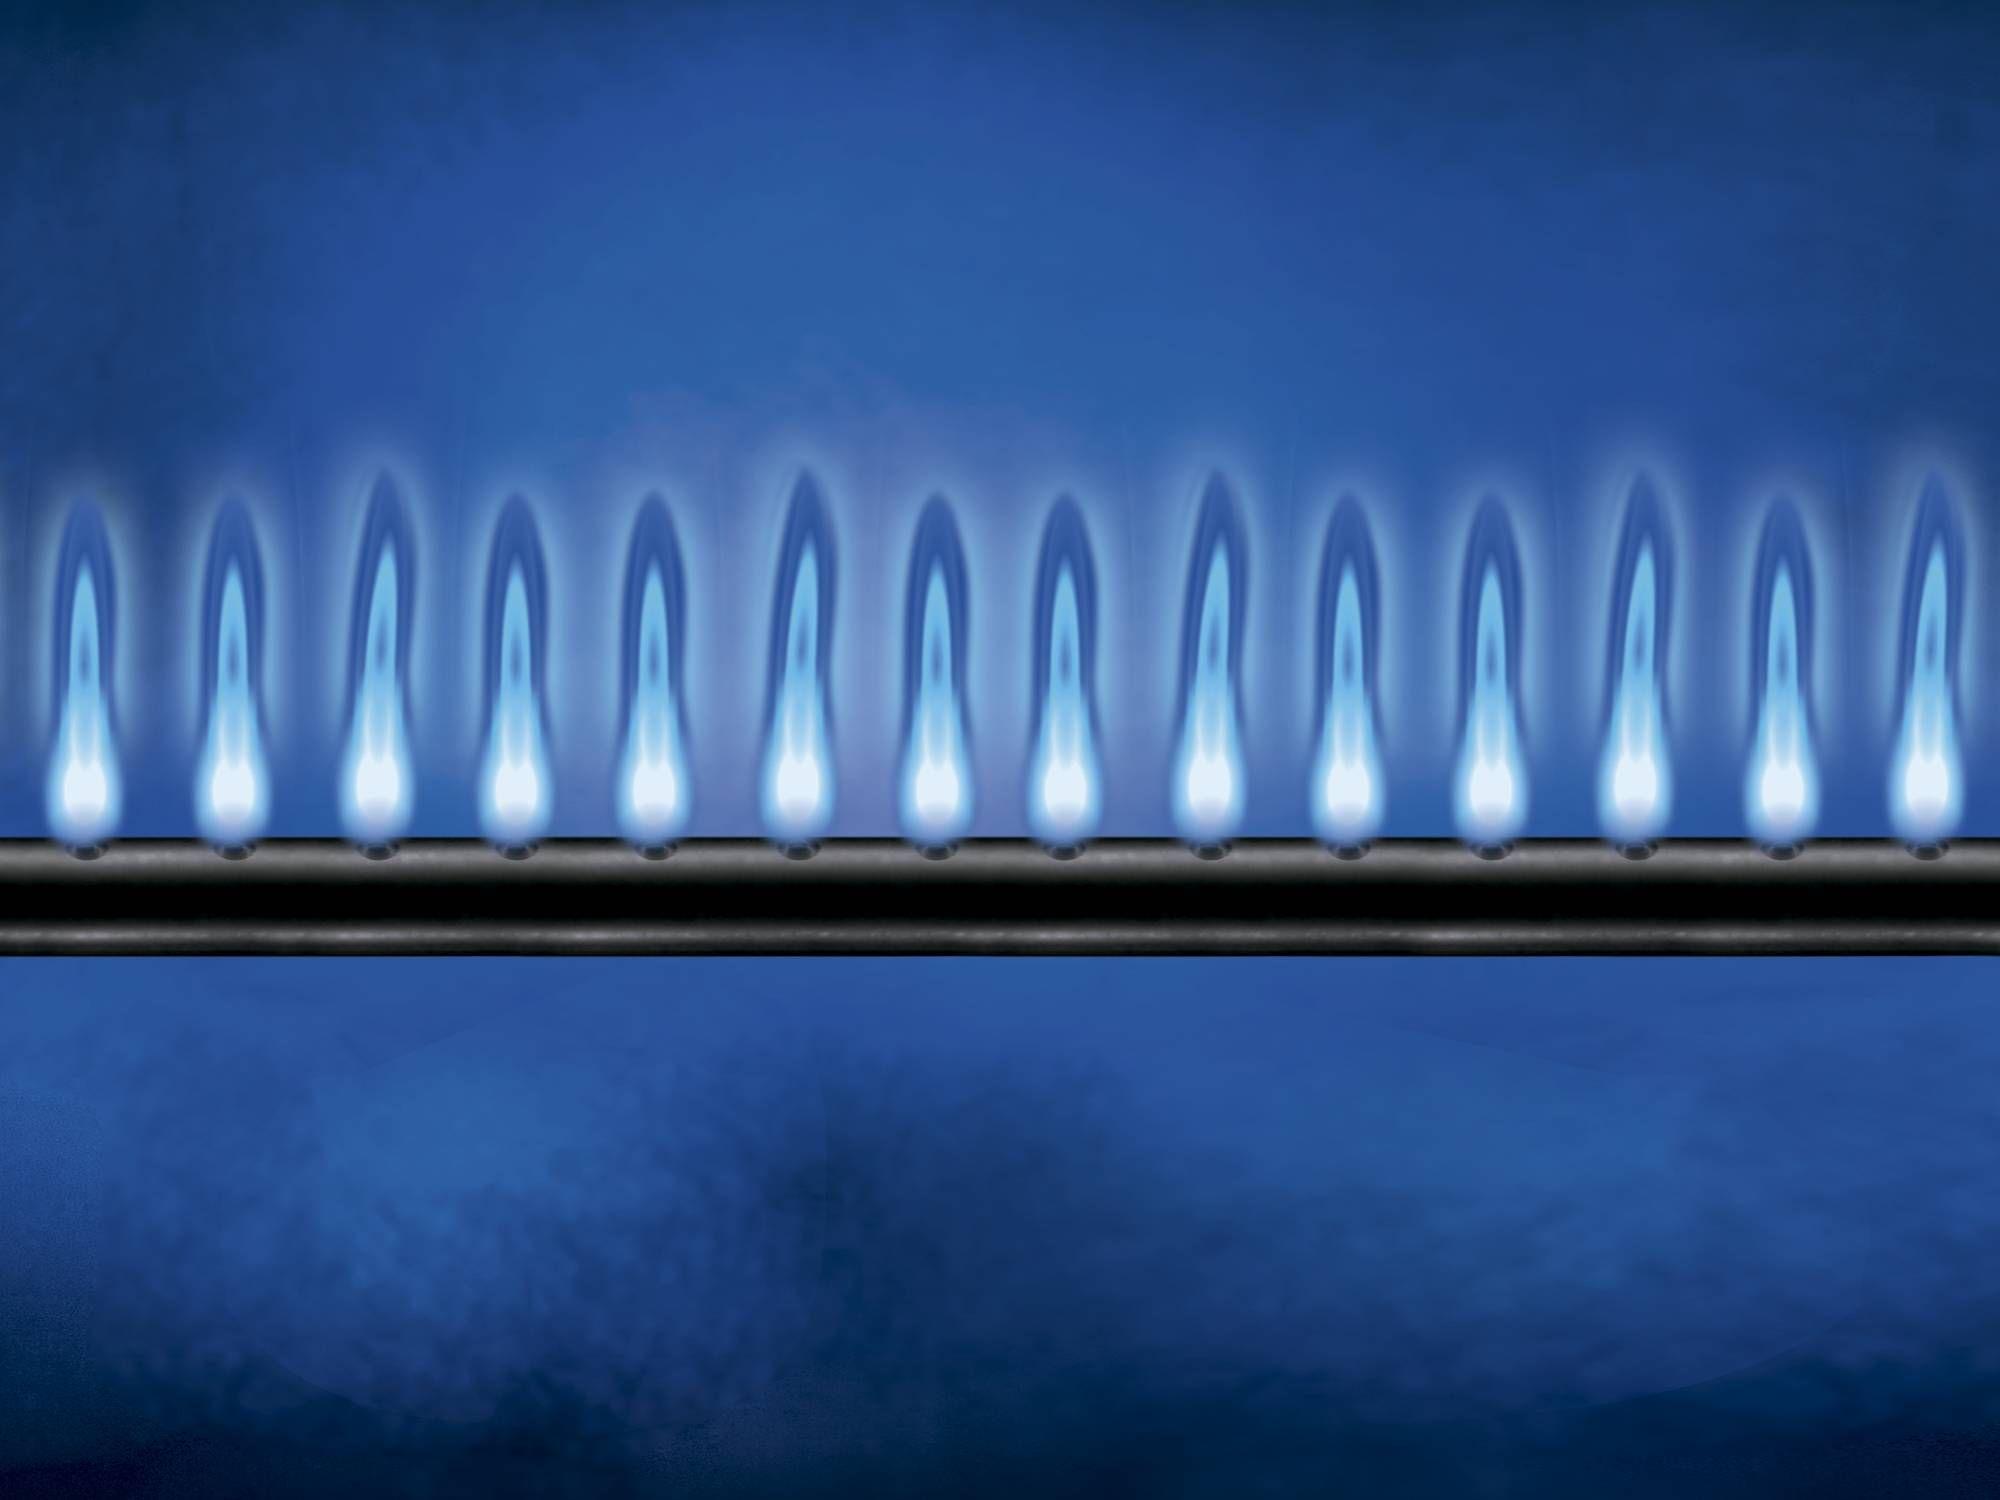 Web analizadores gases